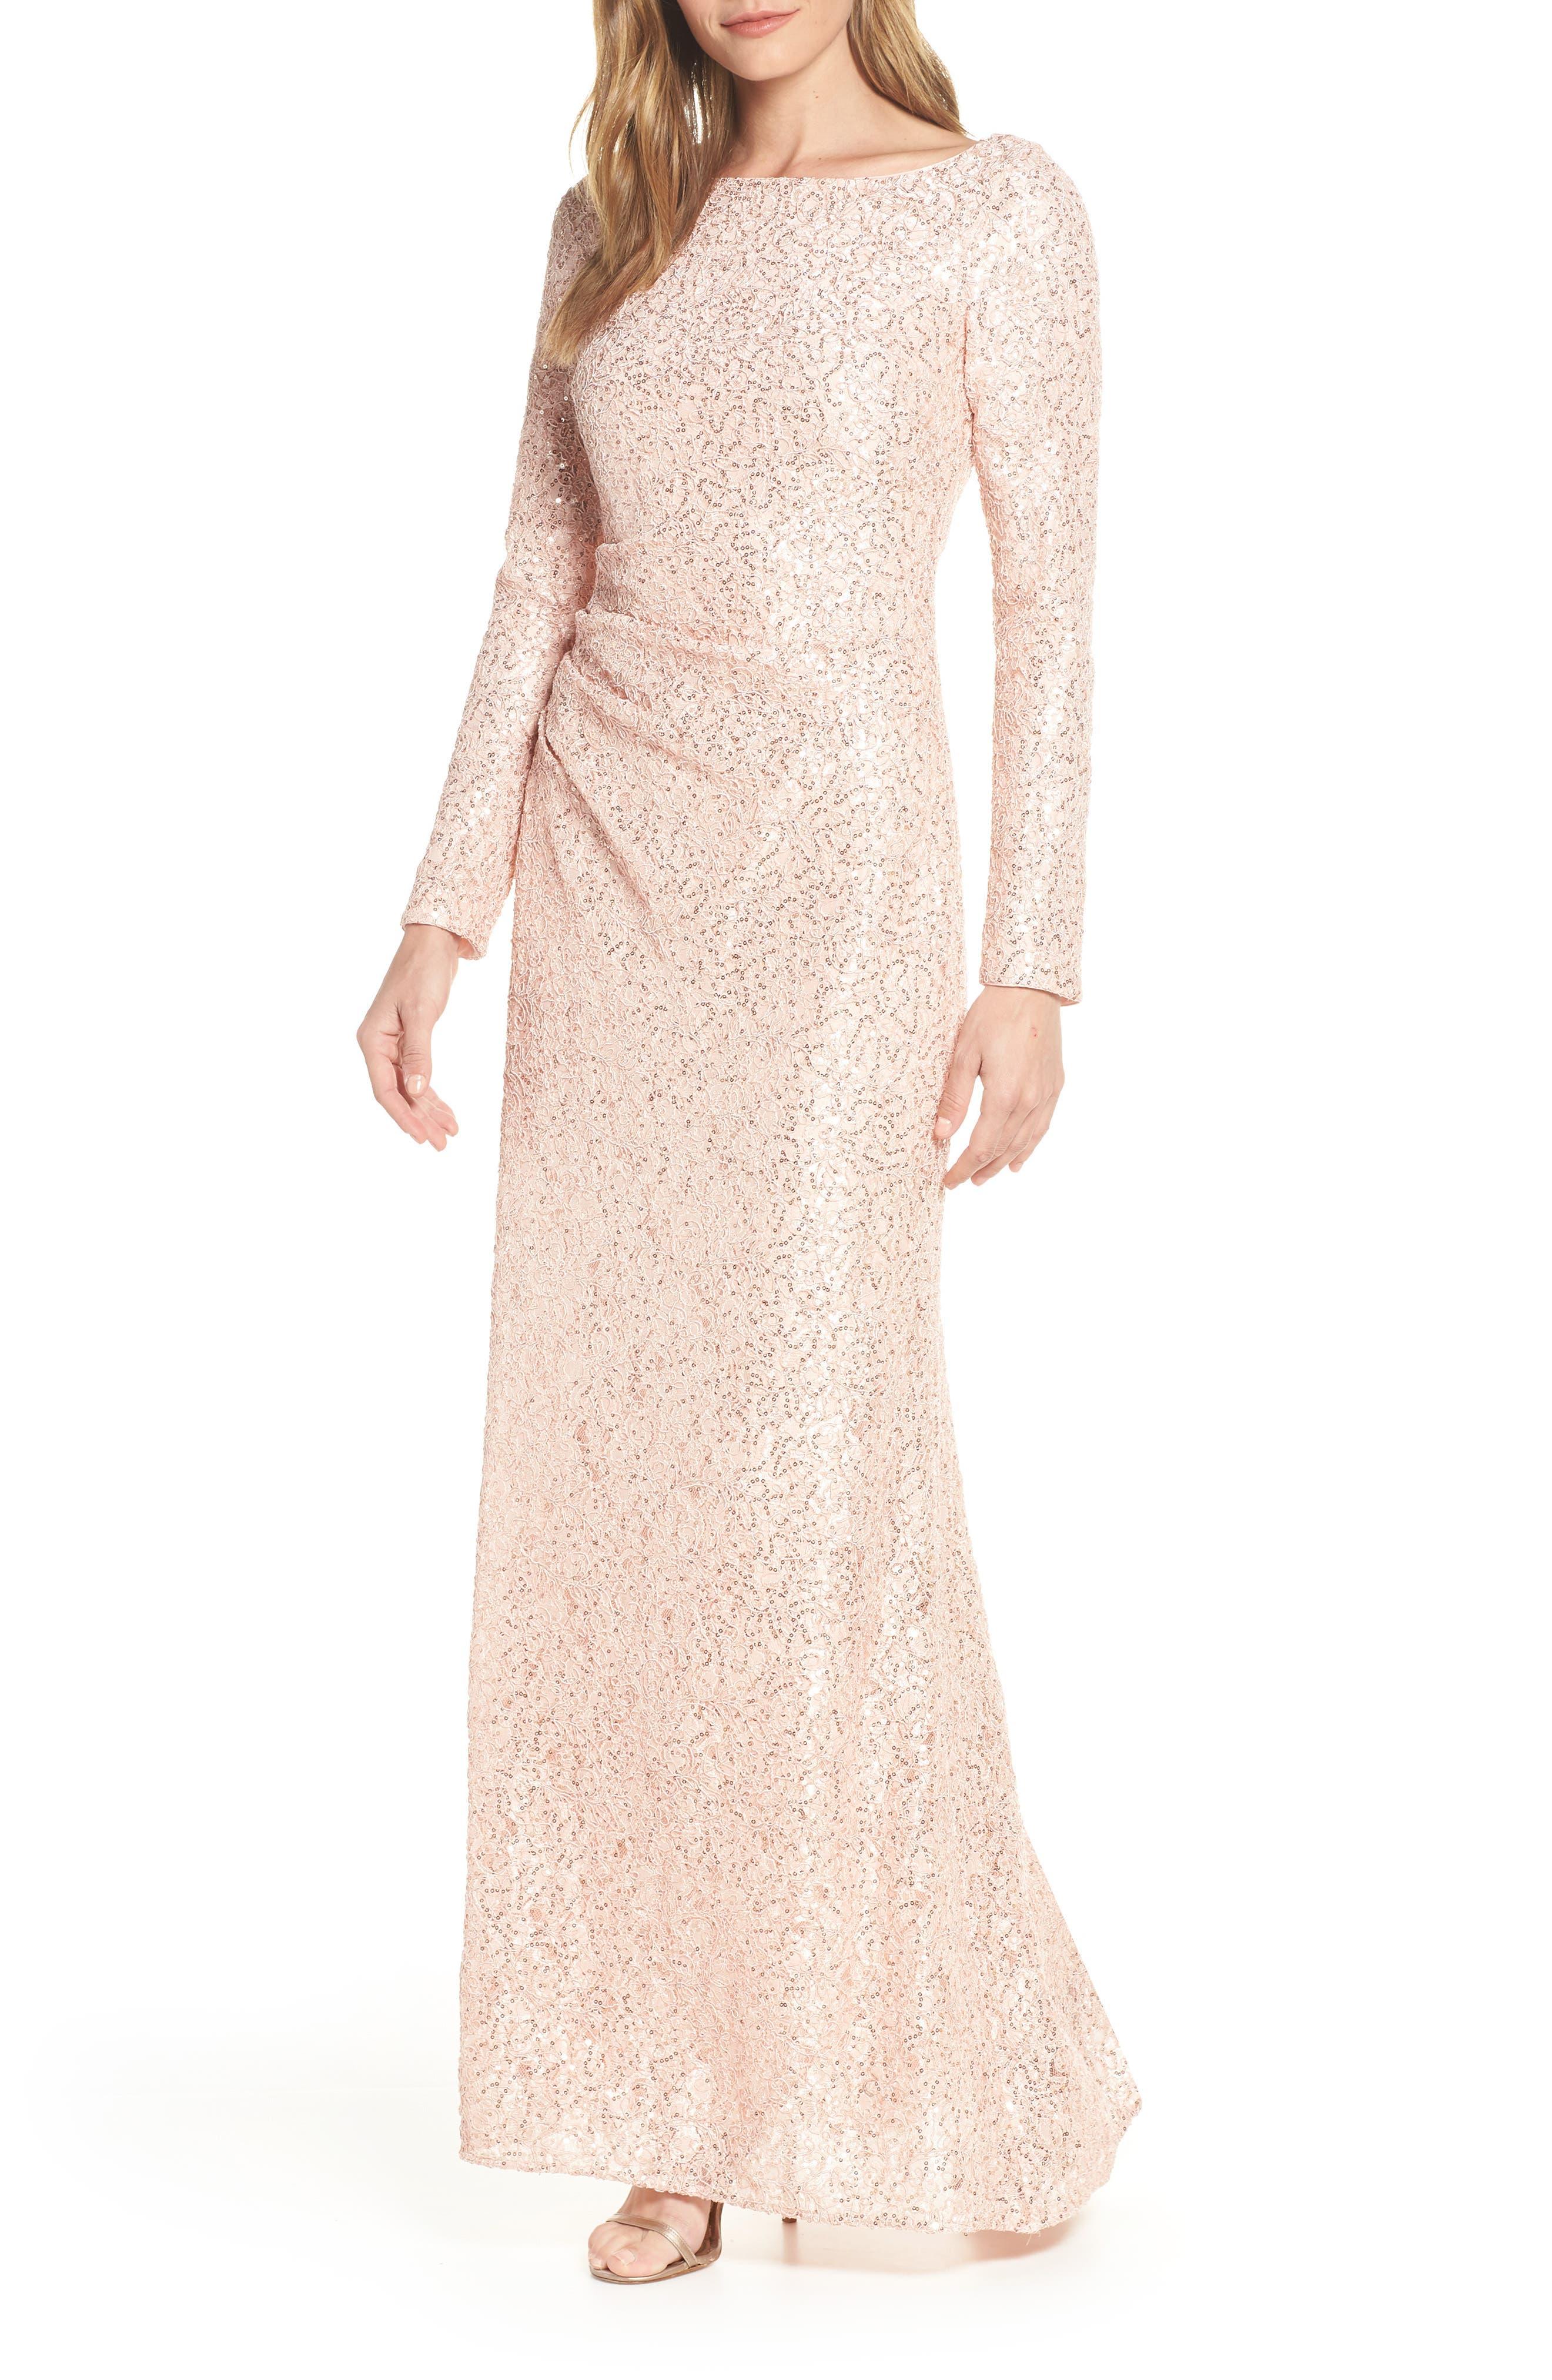 Petite Vince Camuto Sequin Lace Evening Dress, Pink